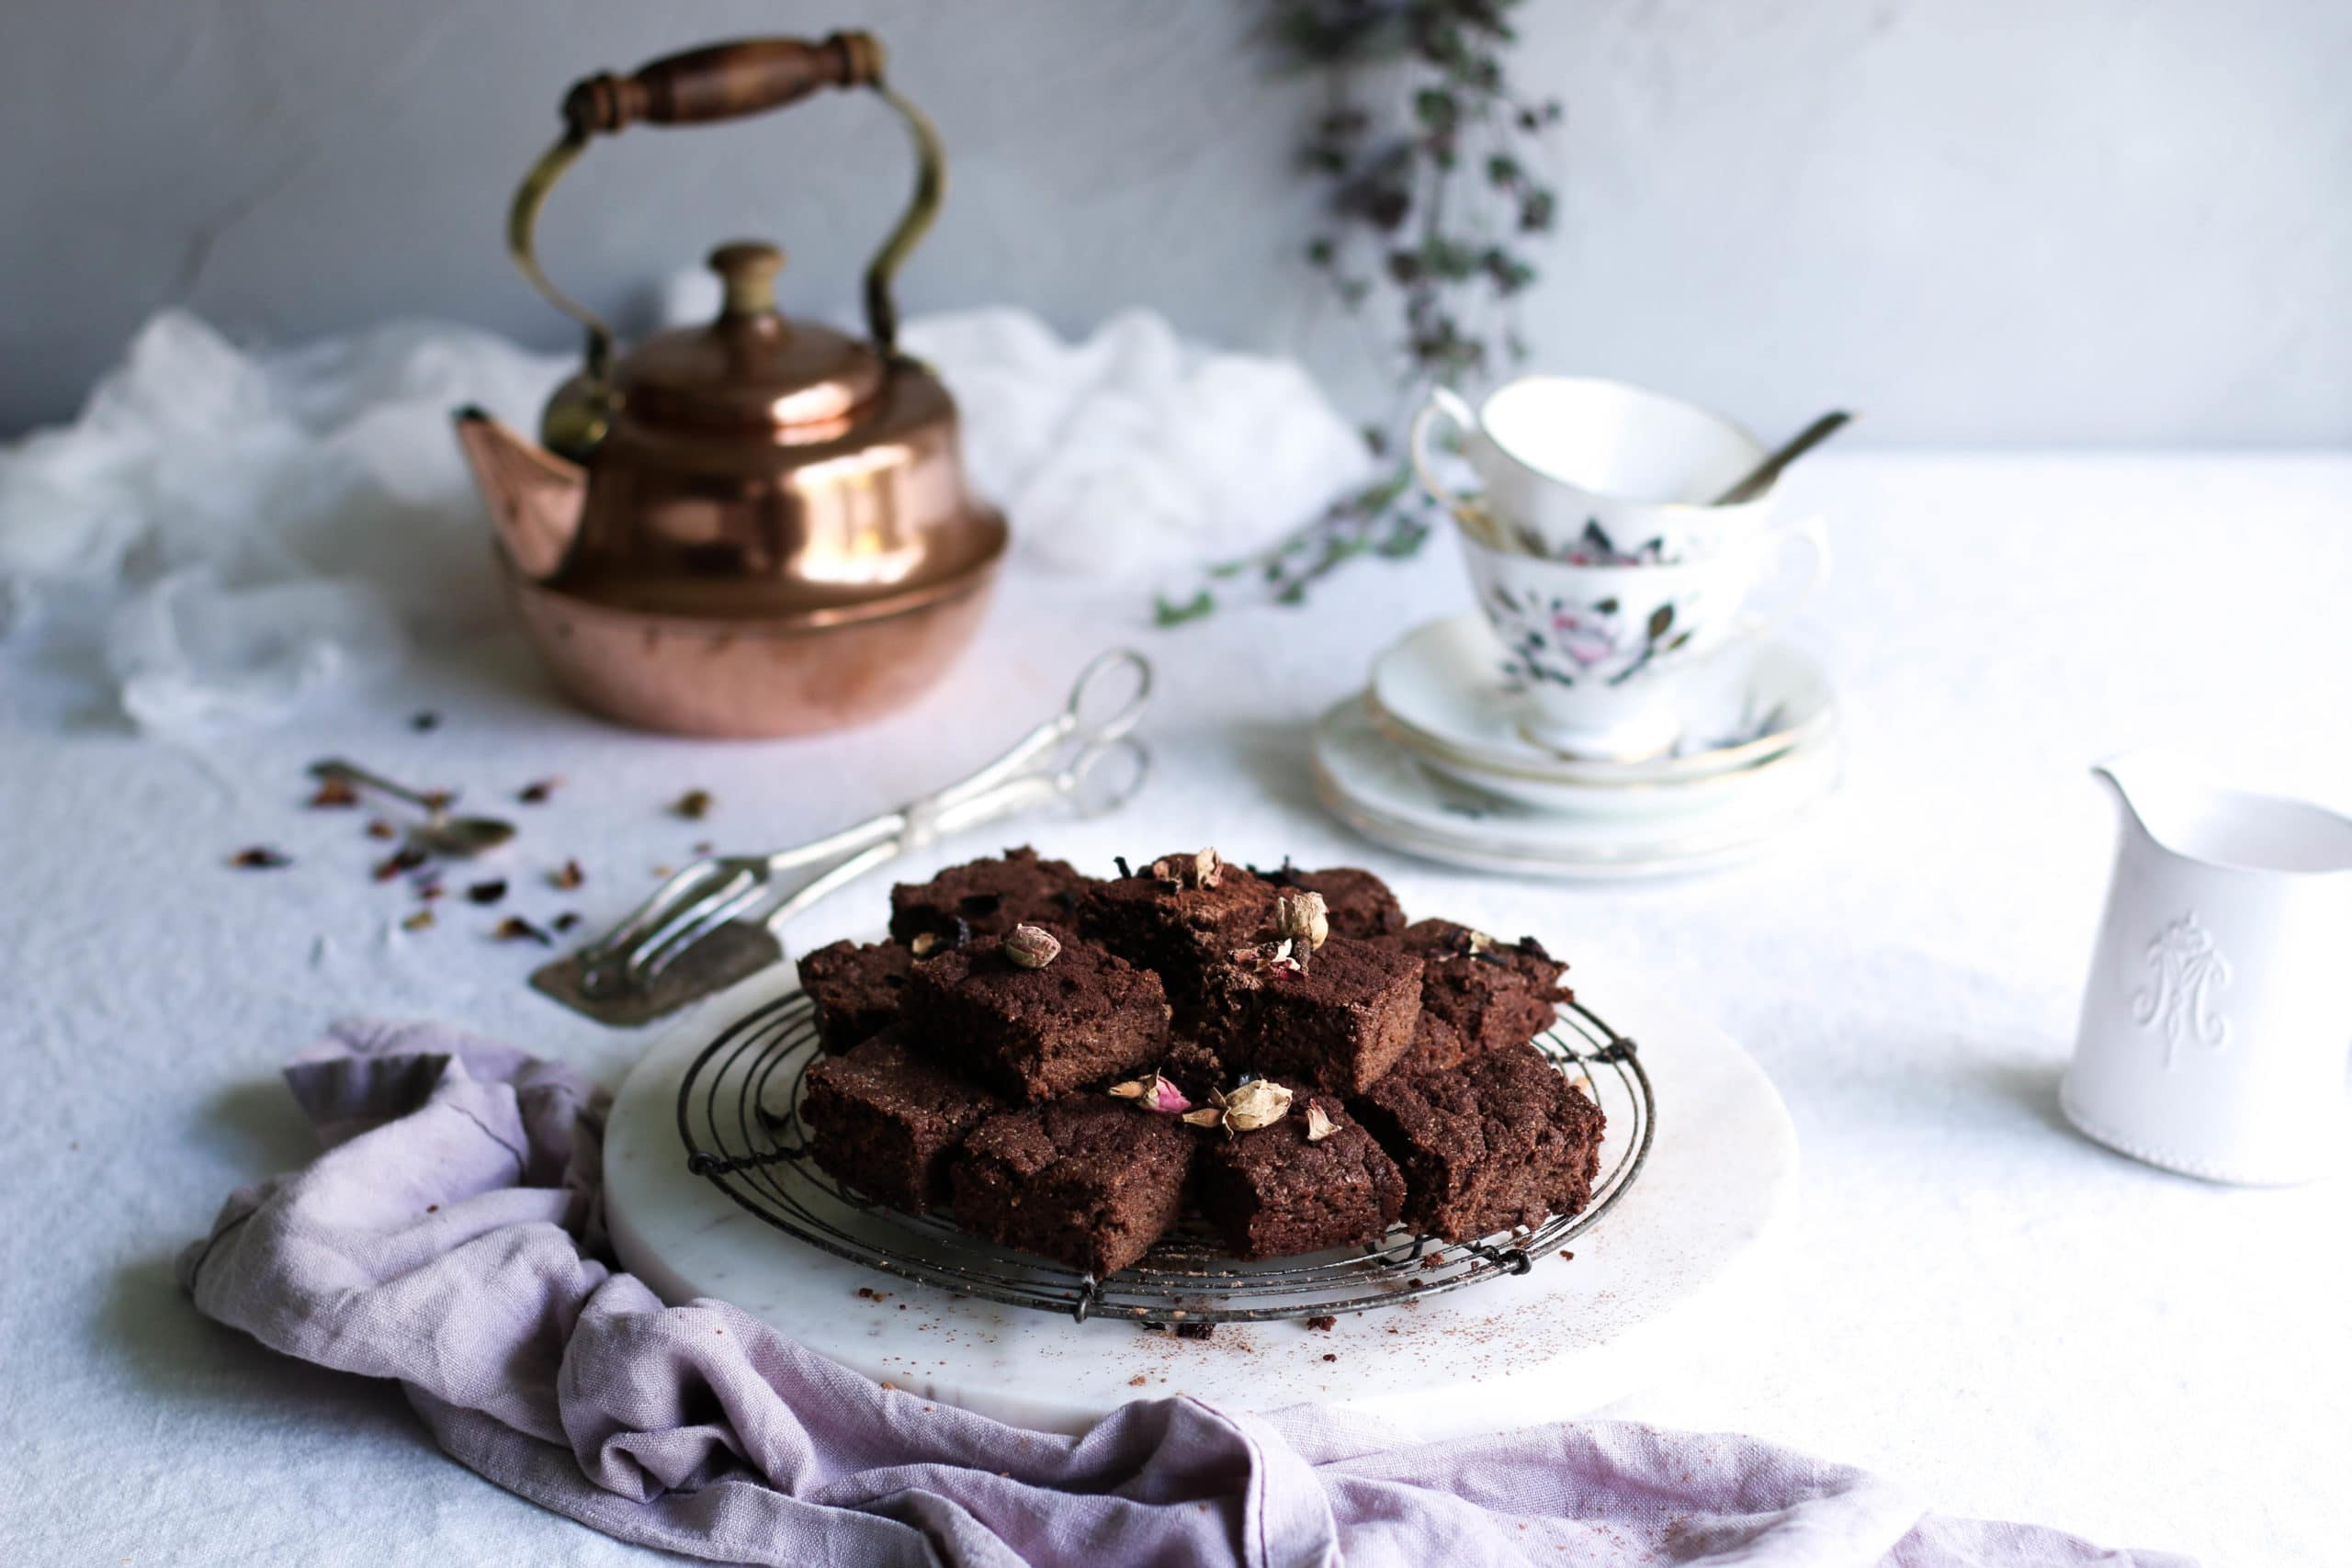 gluten free recipes, vegan treats, plant food recipes, sweet potato recipes, dairy free brownies, gluten free brownies